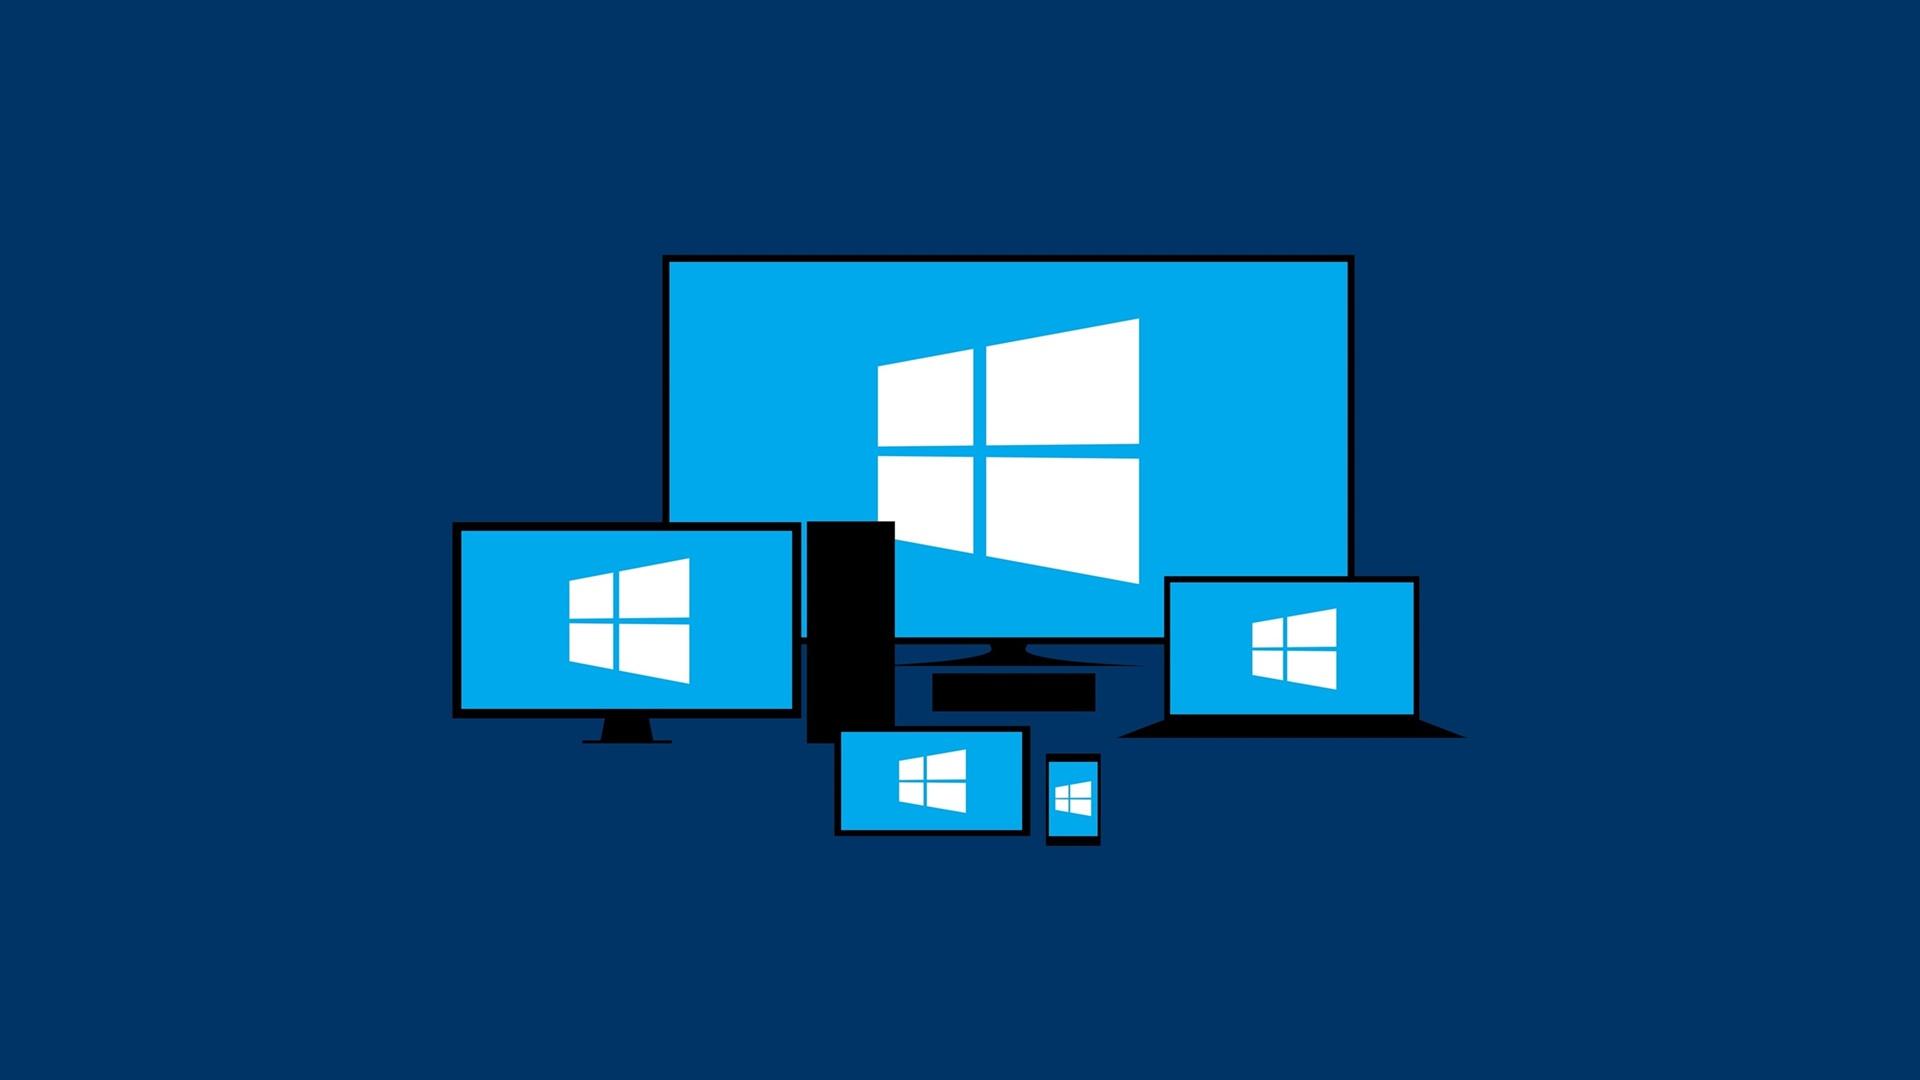 Windows 10 Wallpaper Pack: Windows 10 Wallpaper Pack By Roddiow On DeviantArt